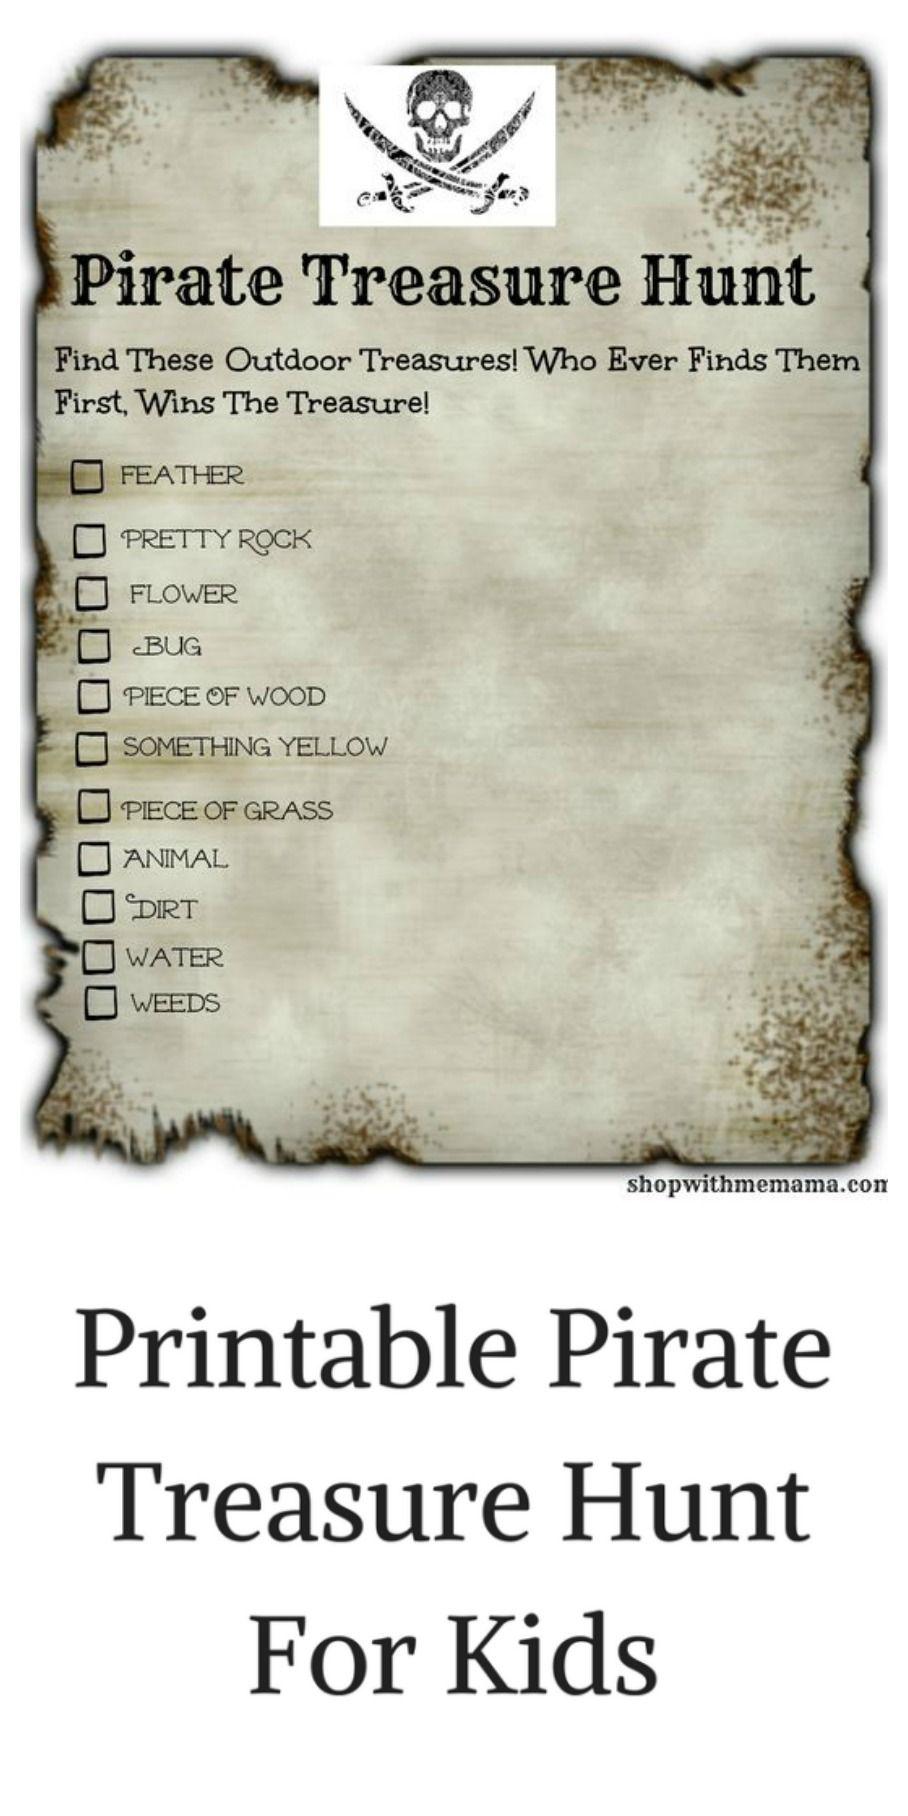 Pirate Treasure Hunt For Kids Free